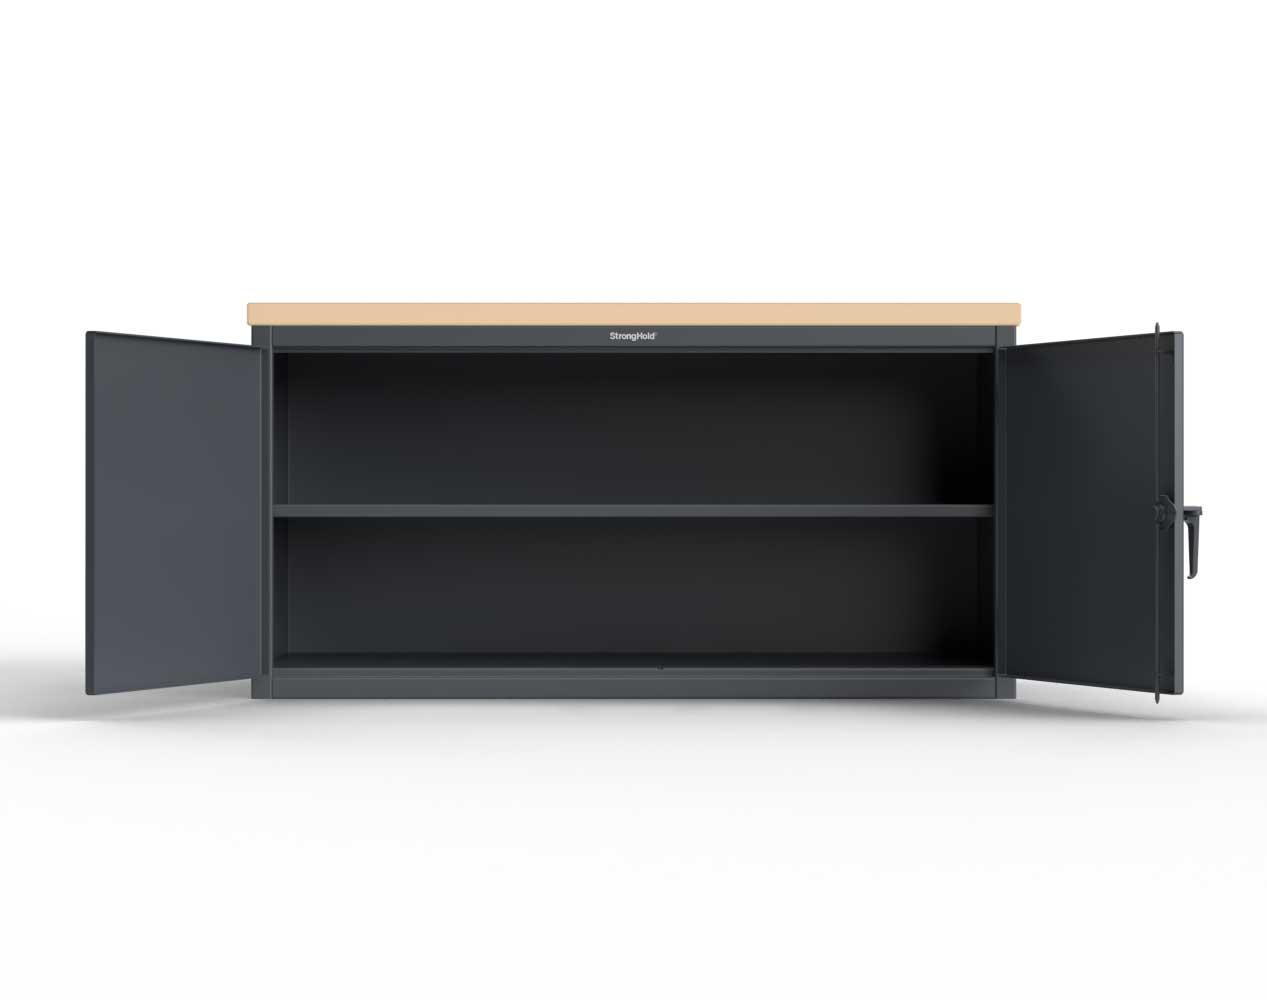 Extra Heavy Duty 12 GA Workbench with Maple Top, 1 Shelf – 96 In. W x 36 In. D x 37 In. H